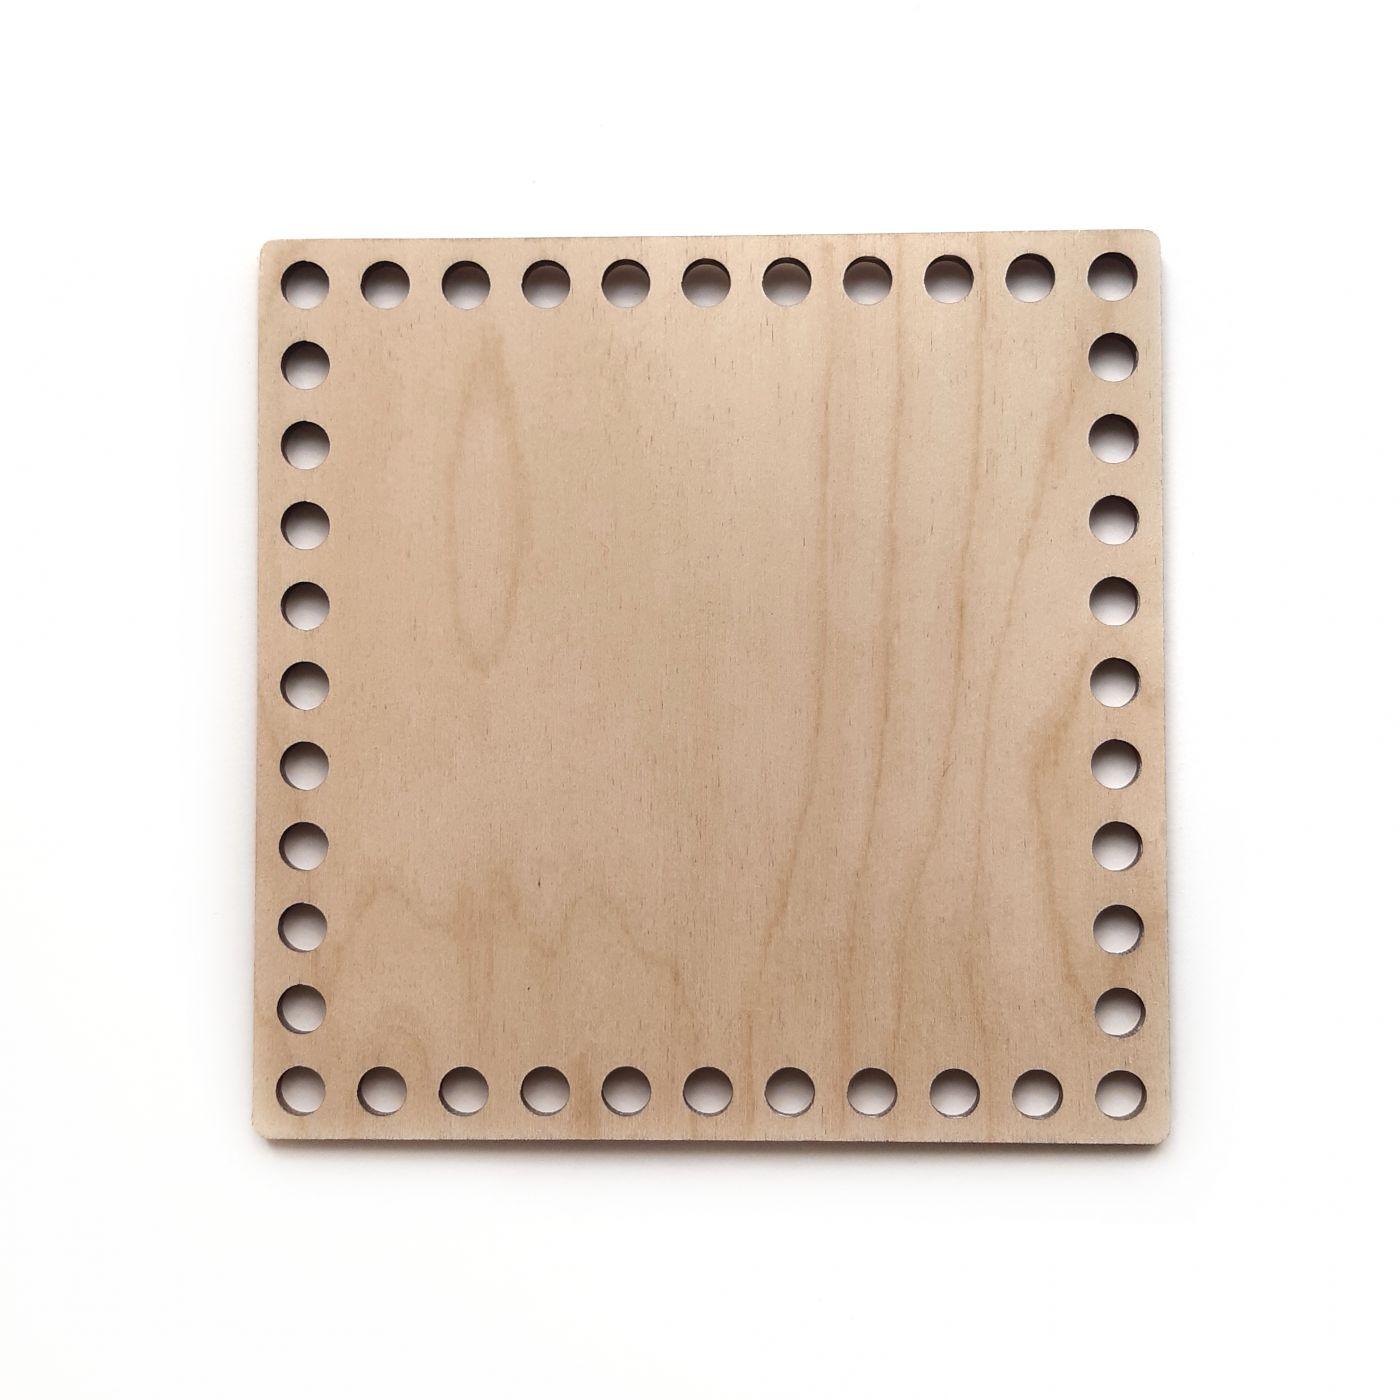 Кравдрат фанера 4 мм